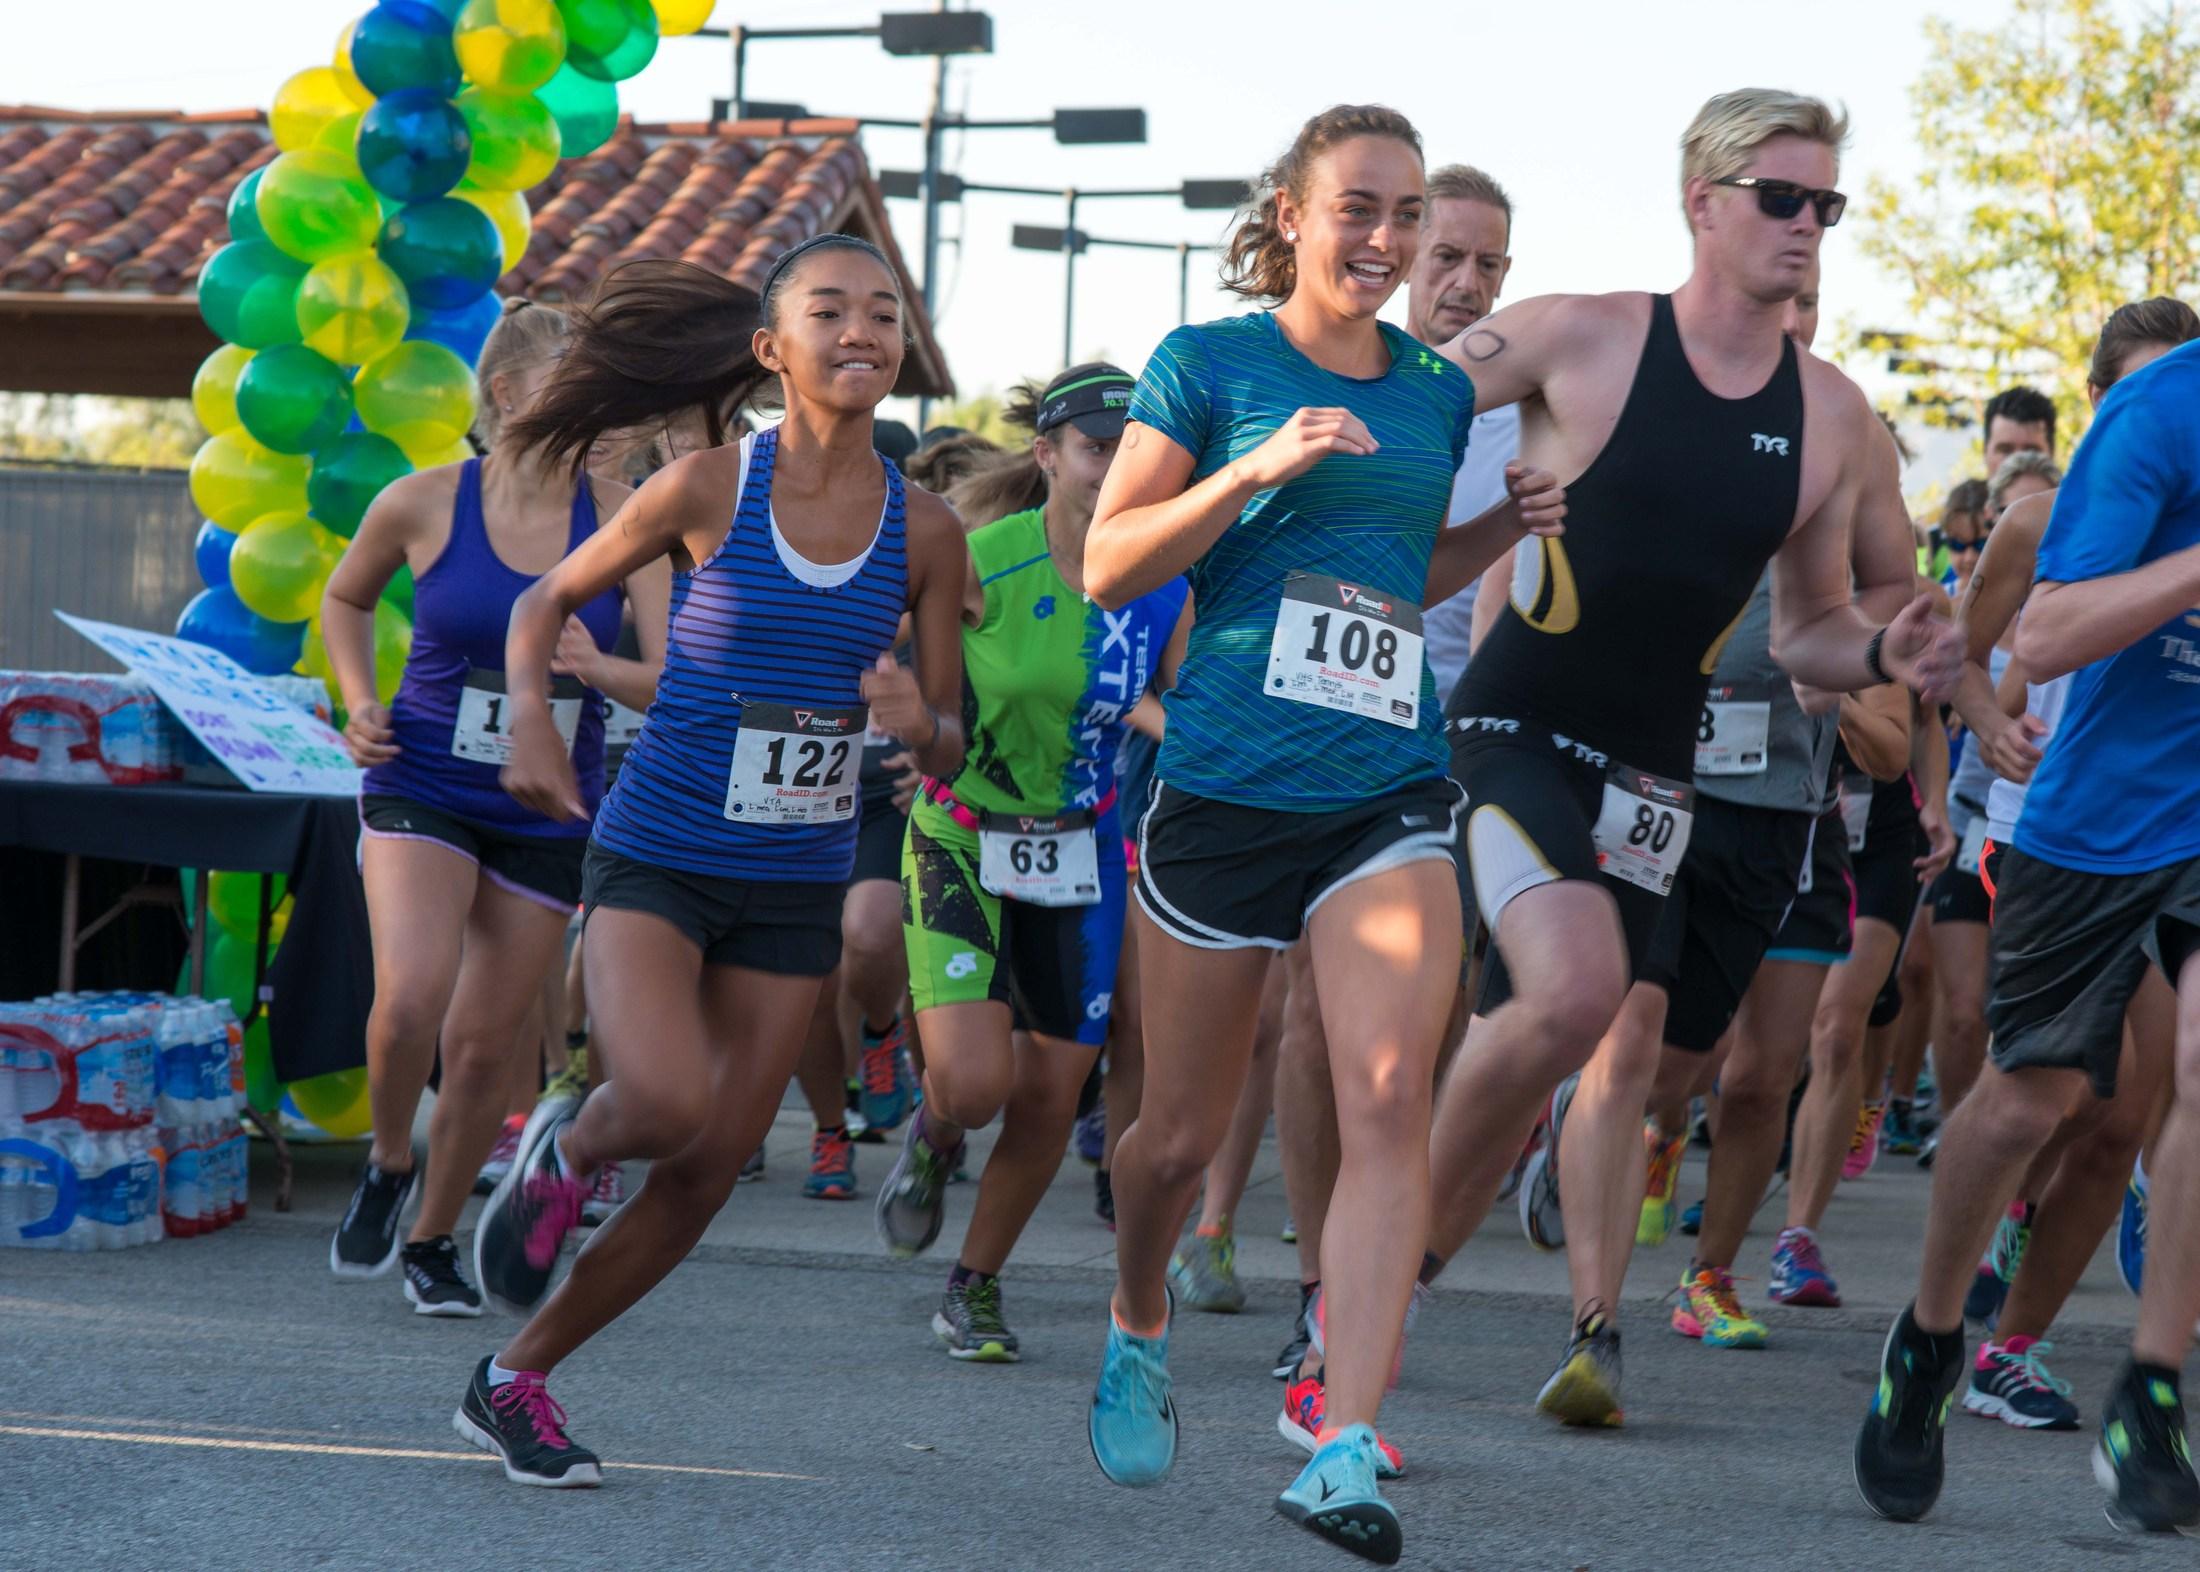 Tri runners